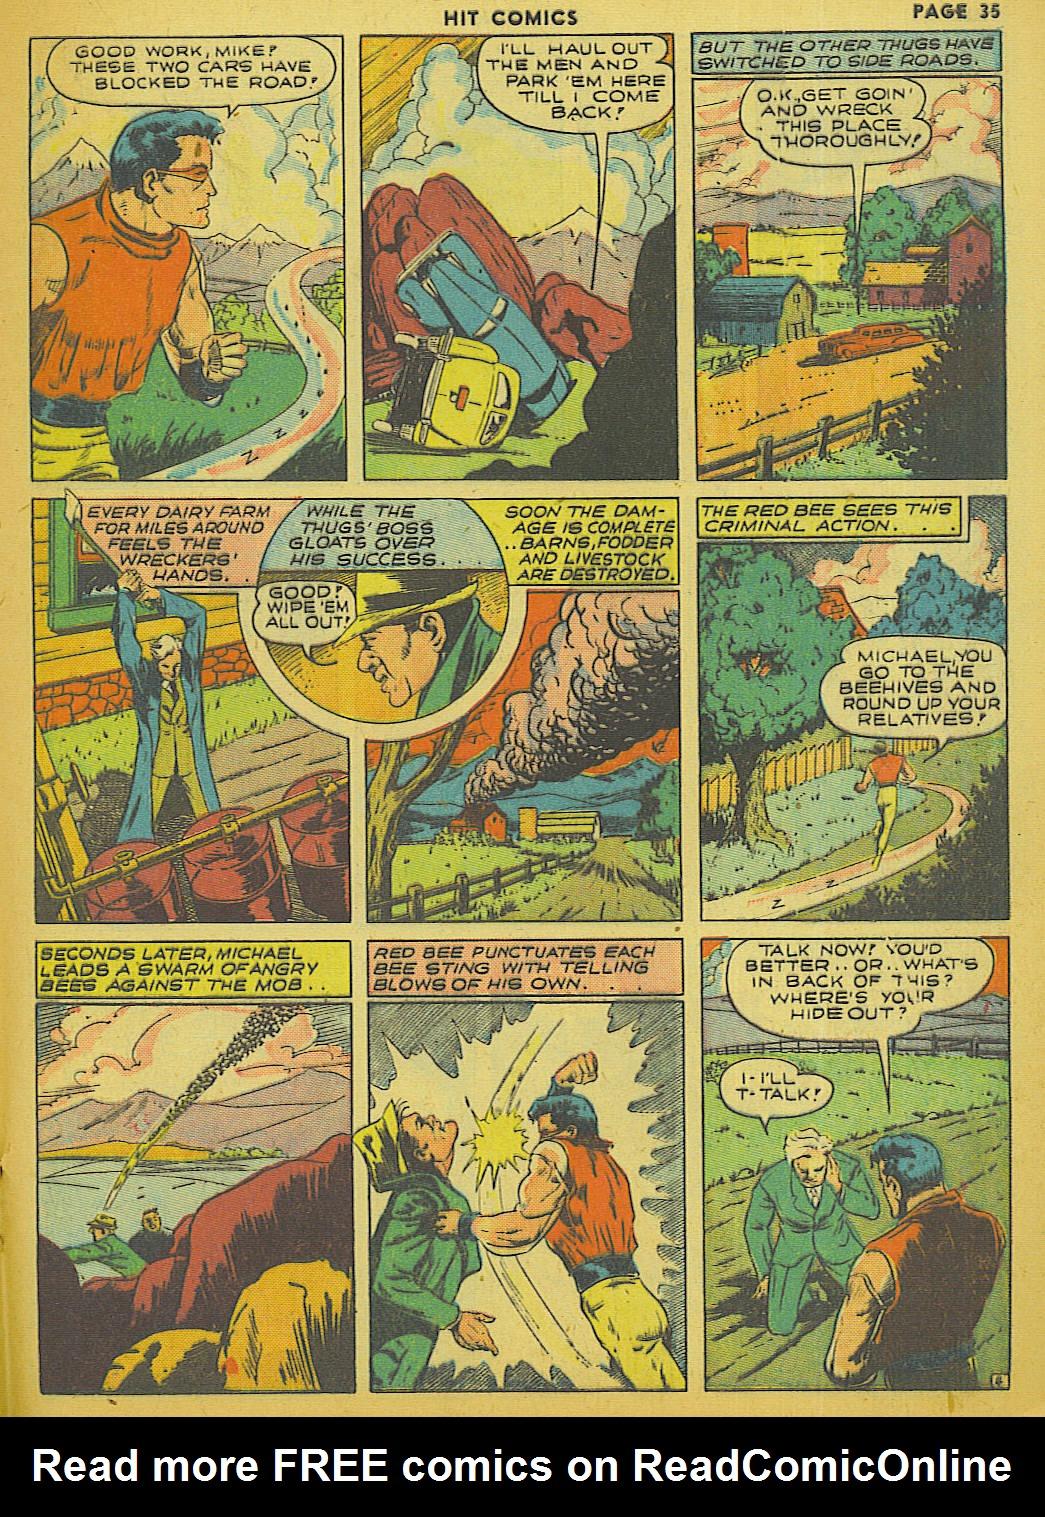 Read online Hit Comics comic -  Issue #13 - 37